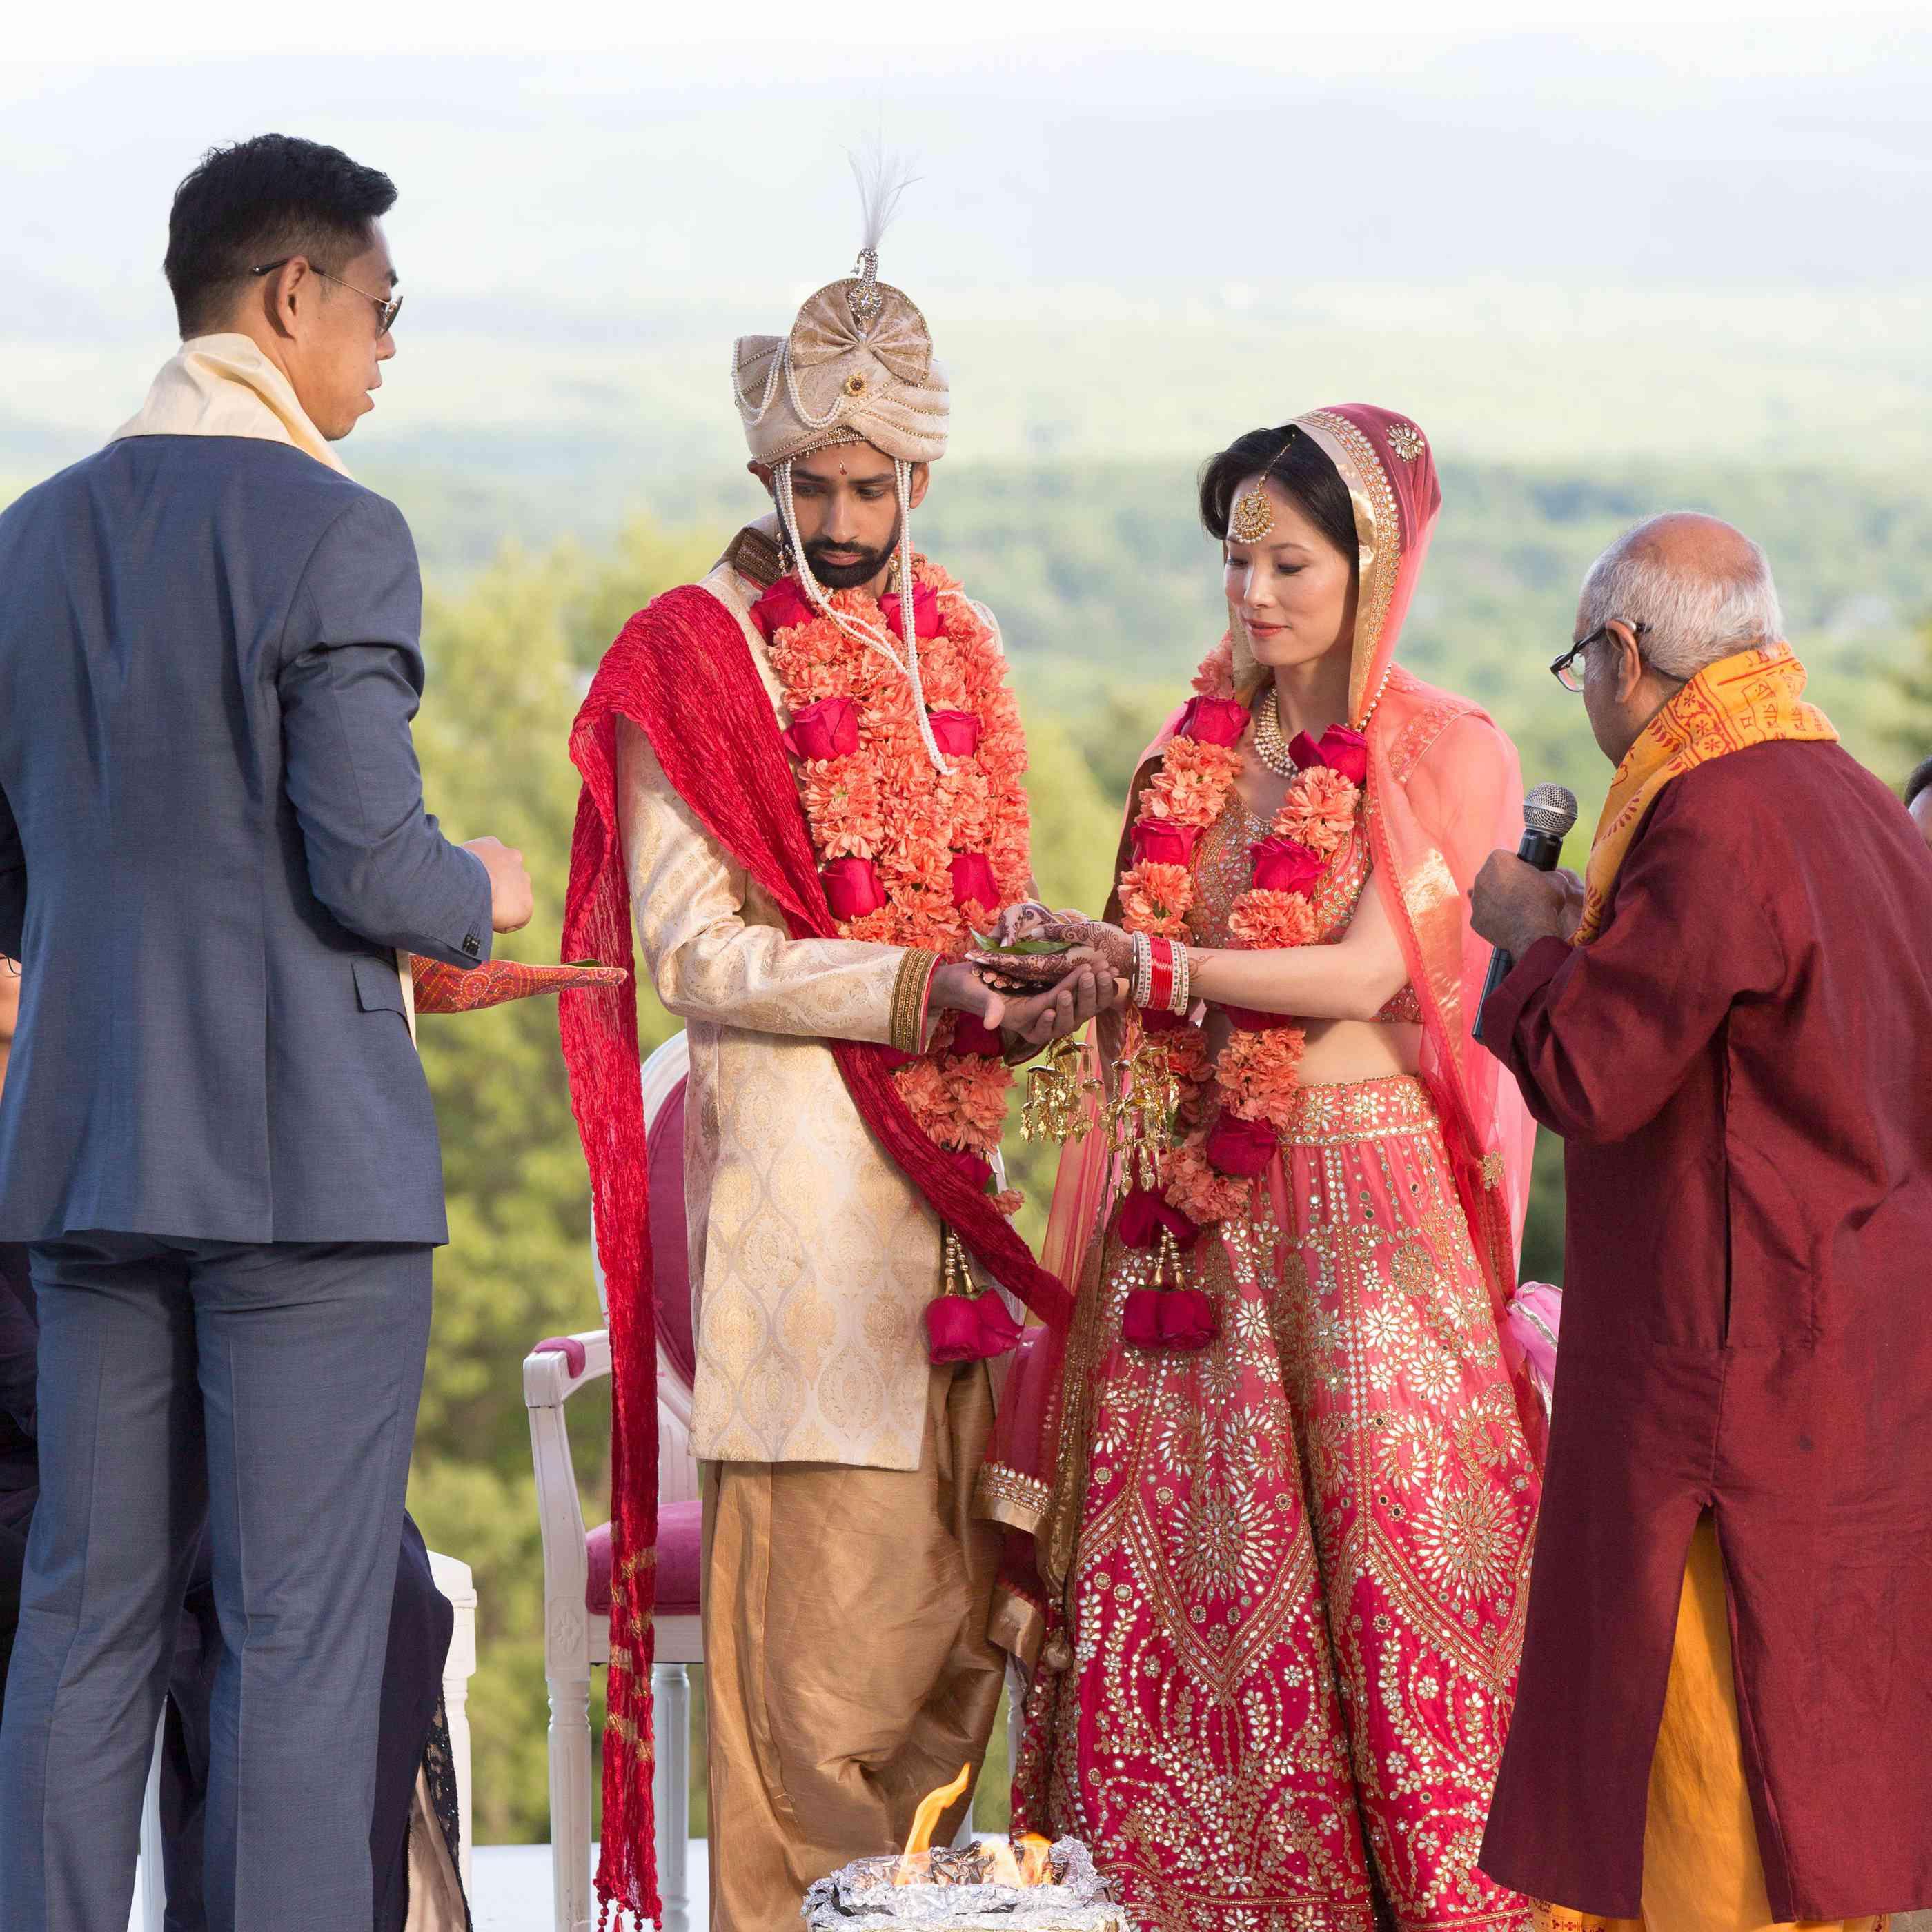 Homam ceremony in hindu wedding